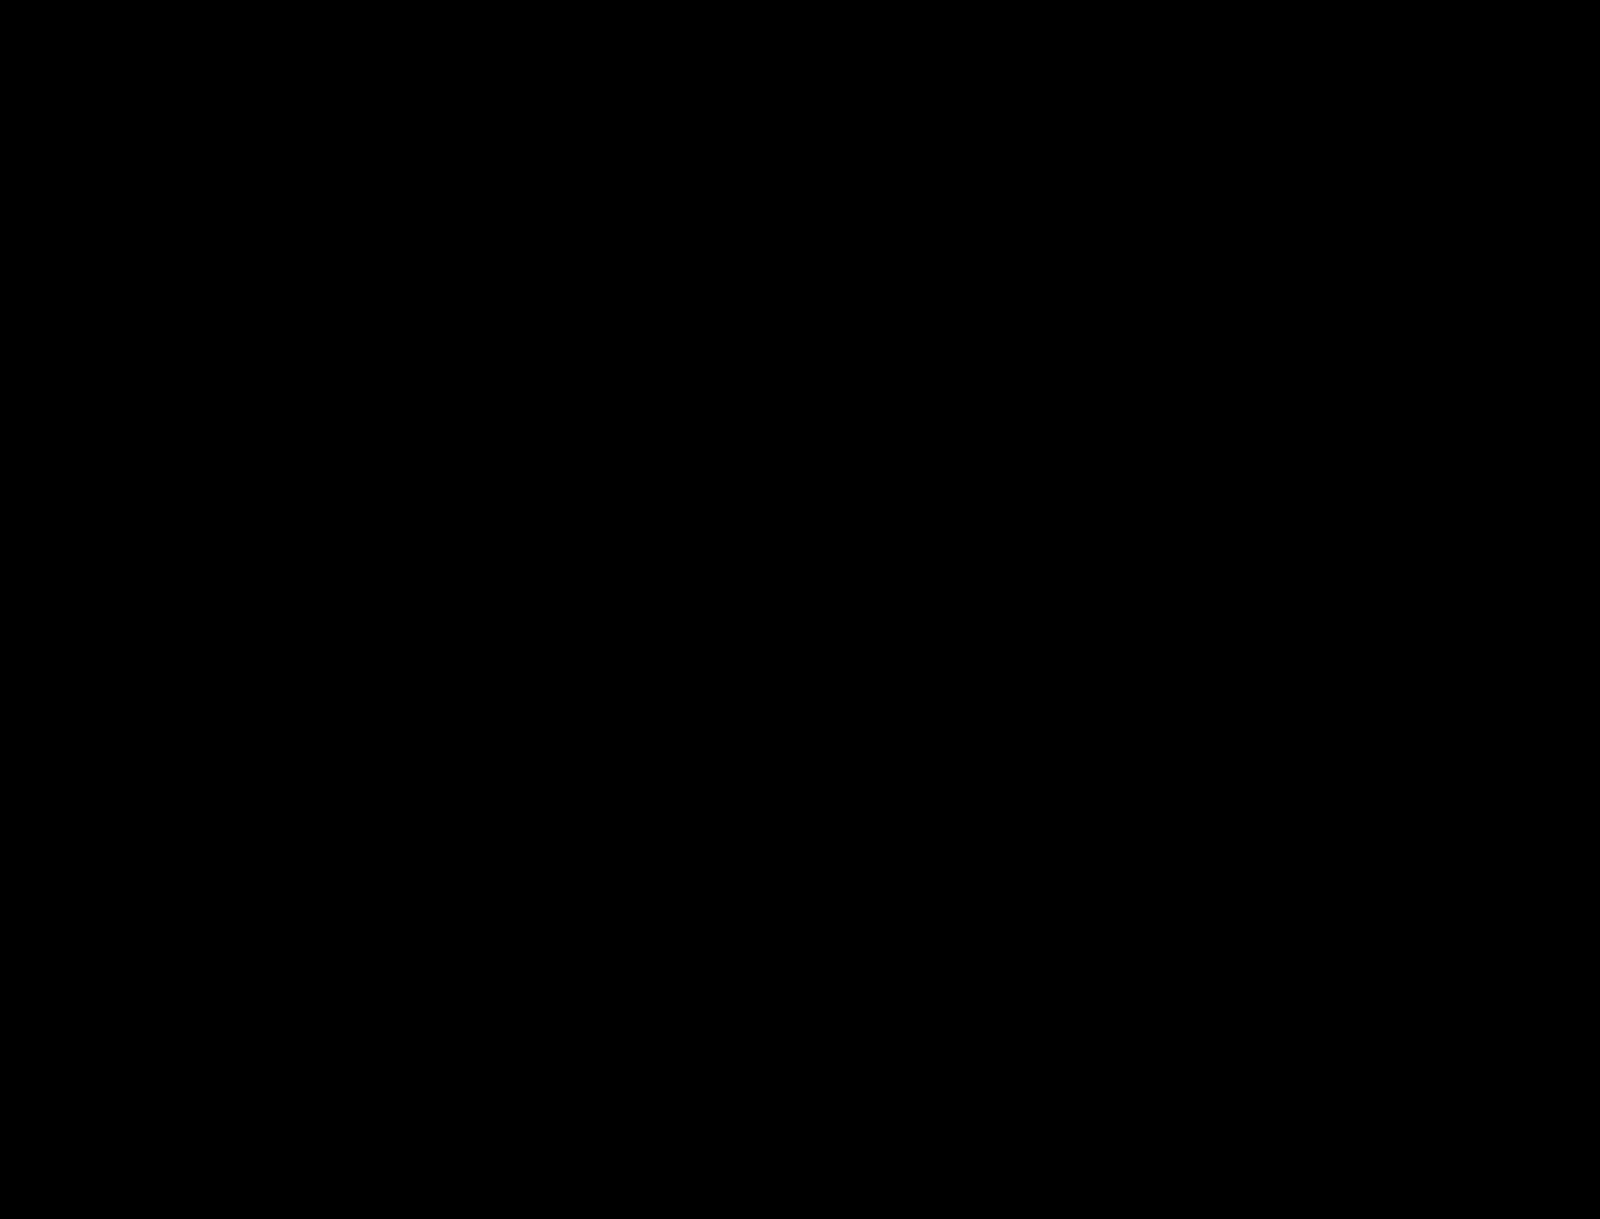 Download harley davidson logo black and white png hq png image download png image harley davidson logo black and white png 681 voltagebd Choice Image